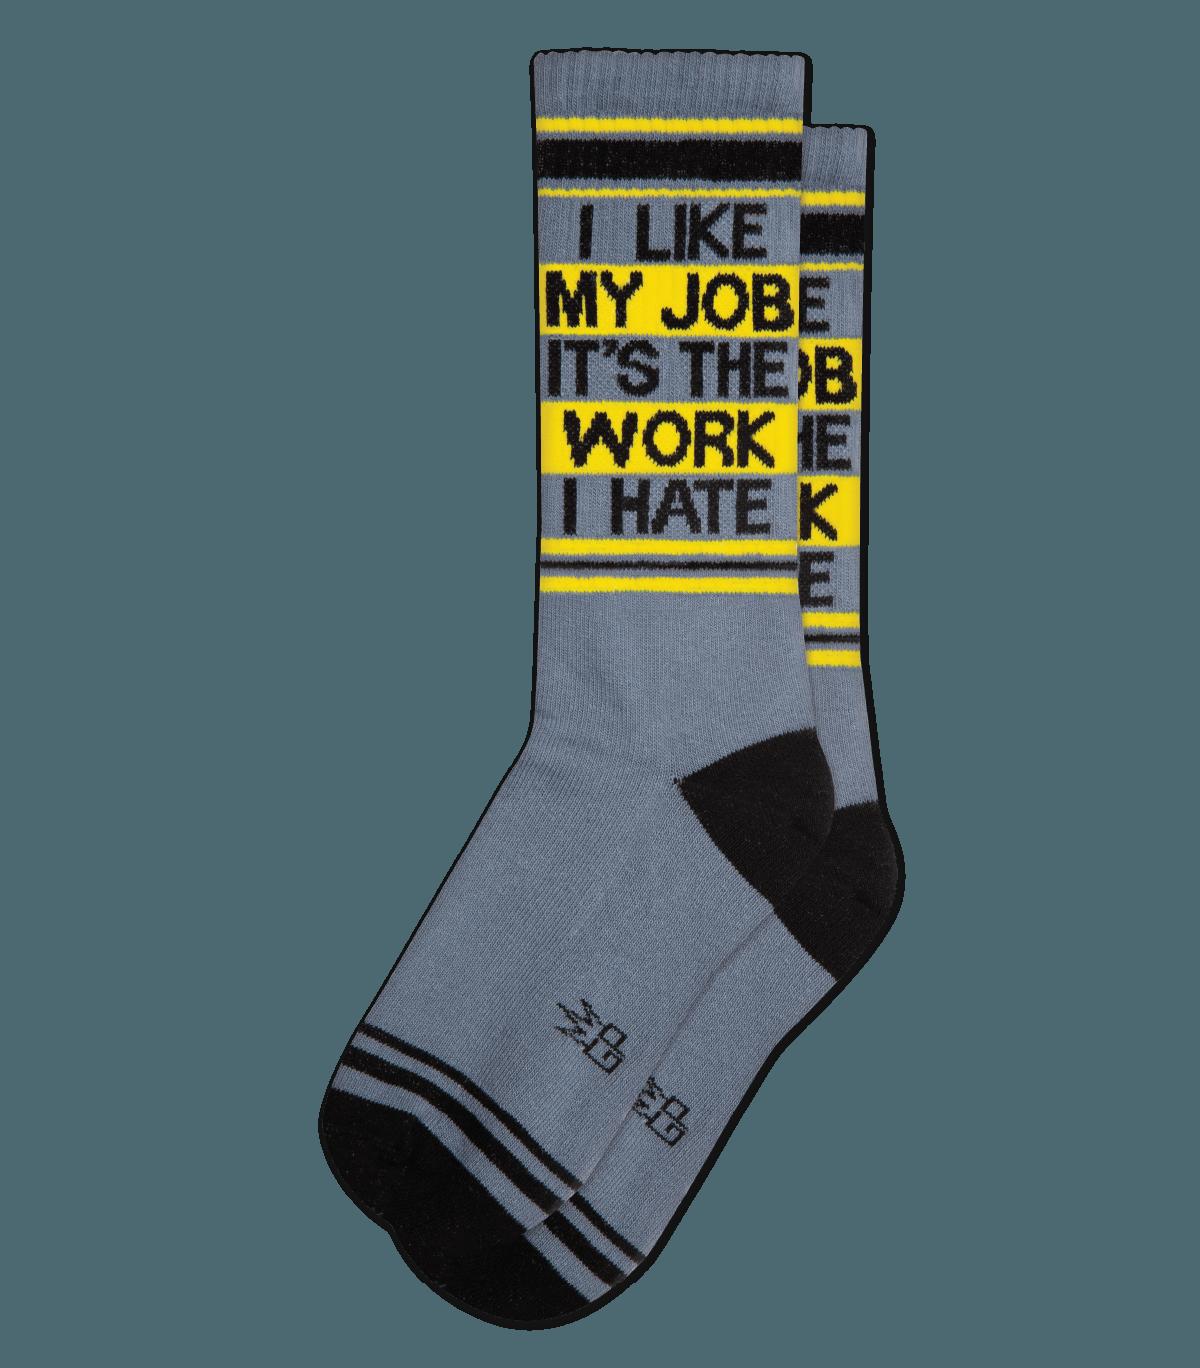 I Like My Job It's The Work I Hate Gym Socks